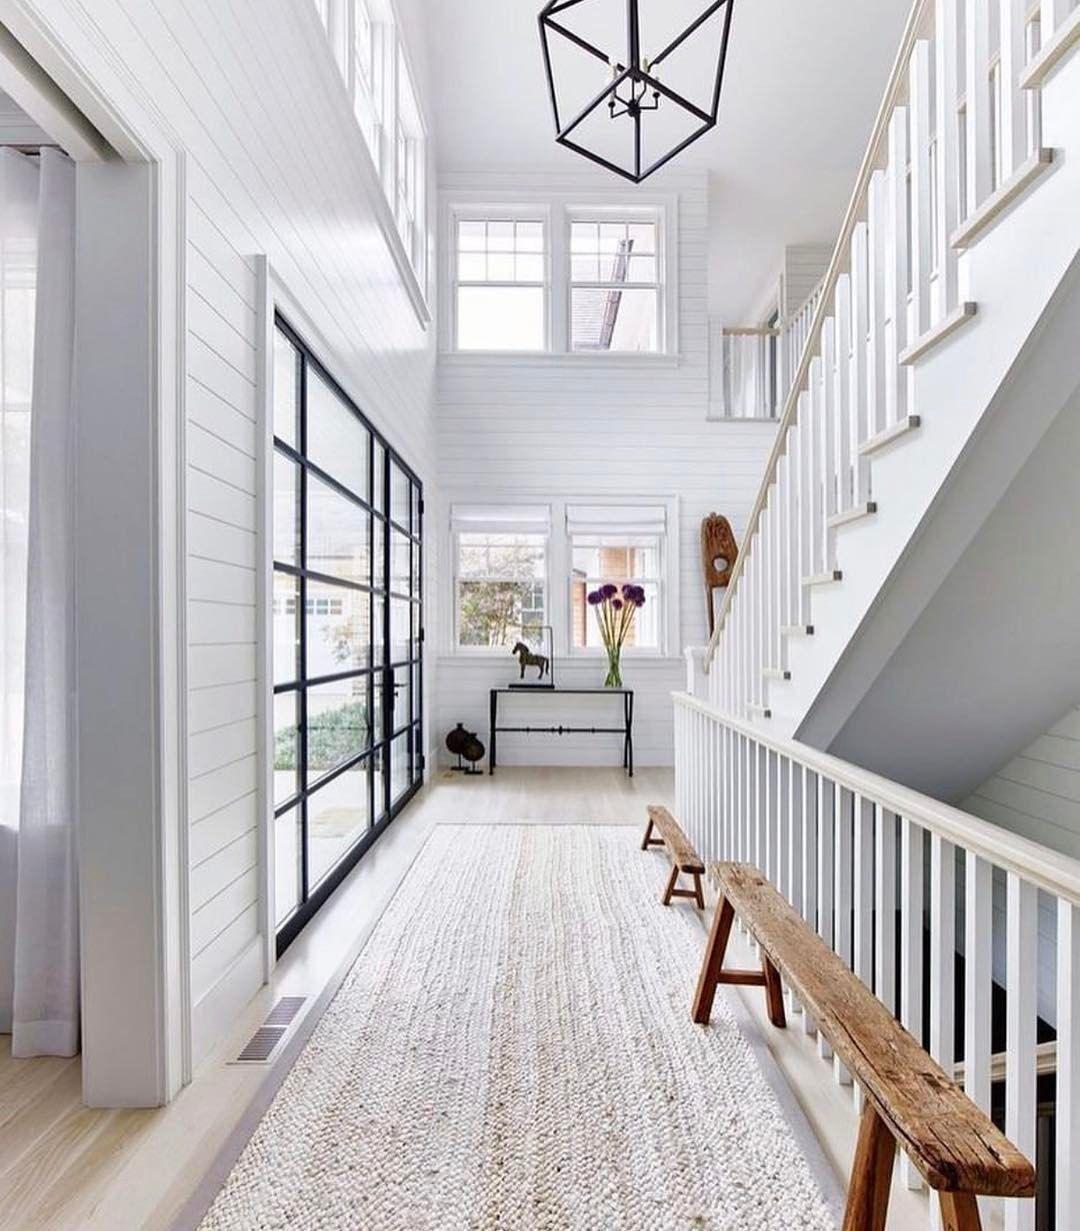 BECKI OWENS- 7 Elements Of A Modern Farmhouse. Fresh White